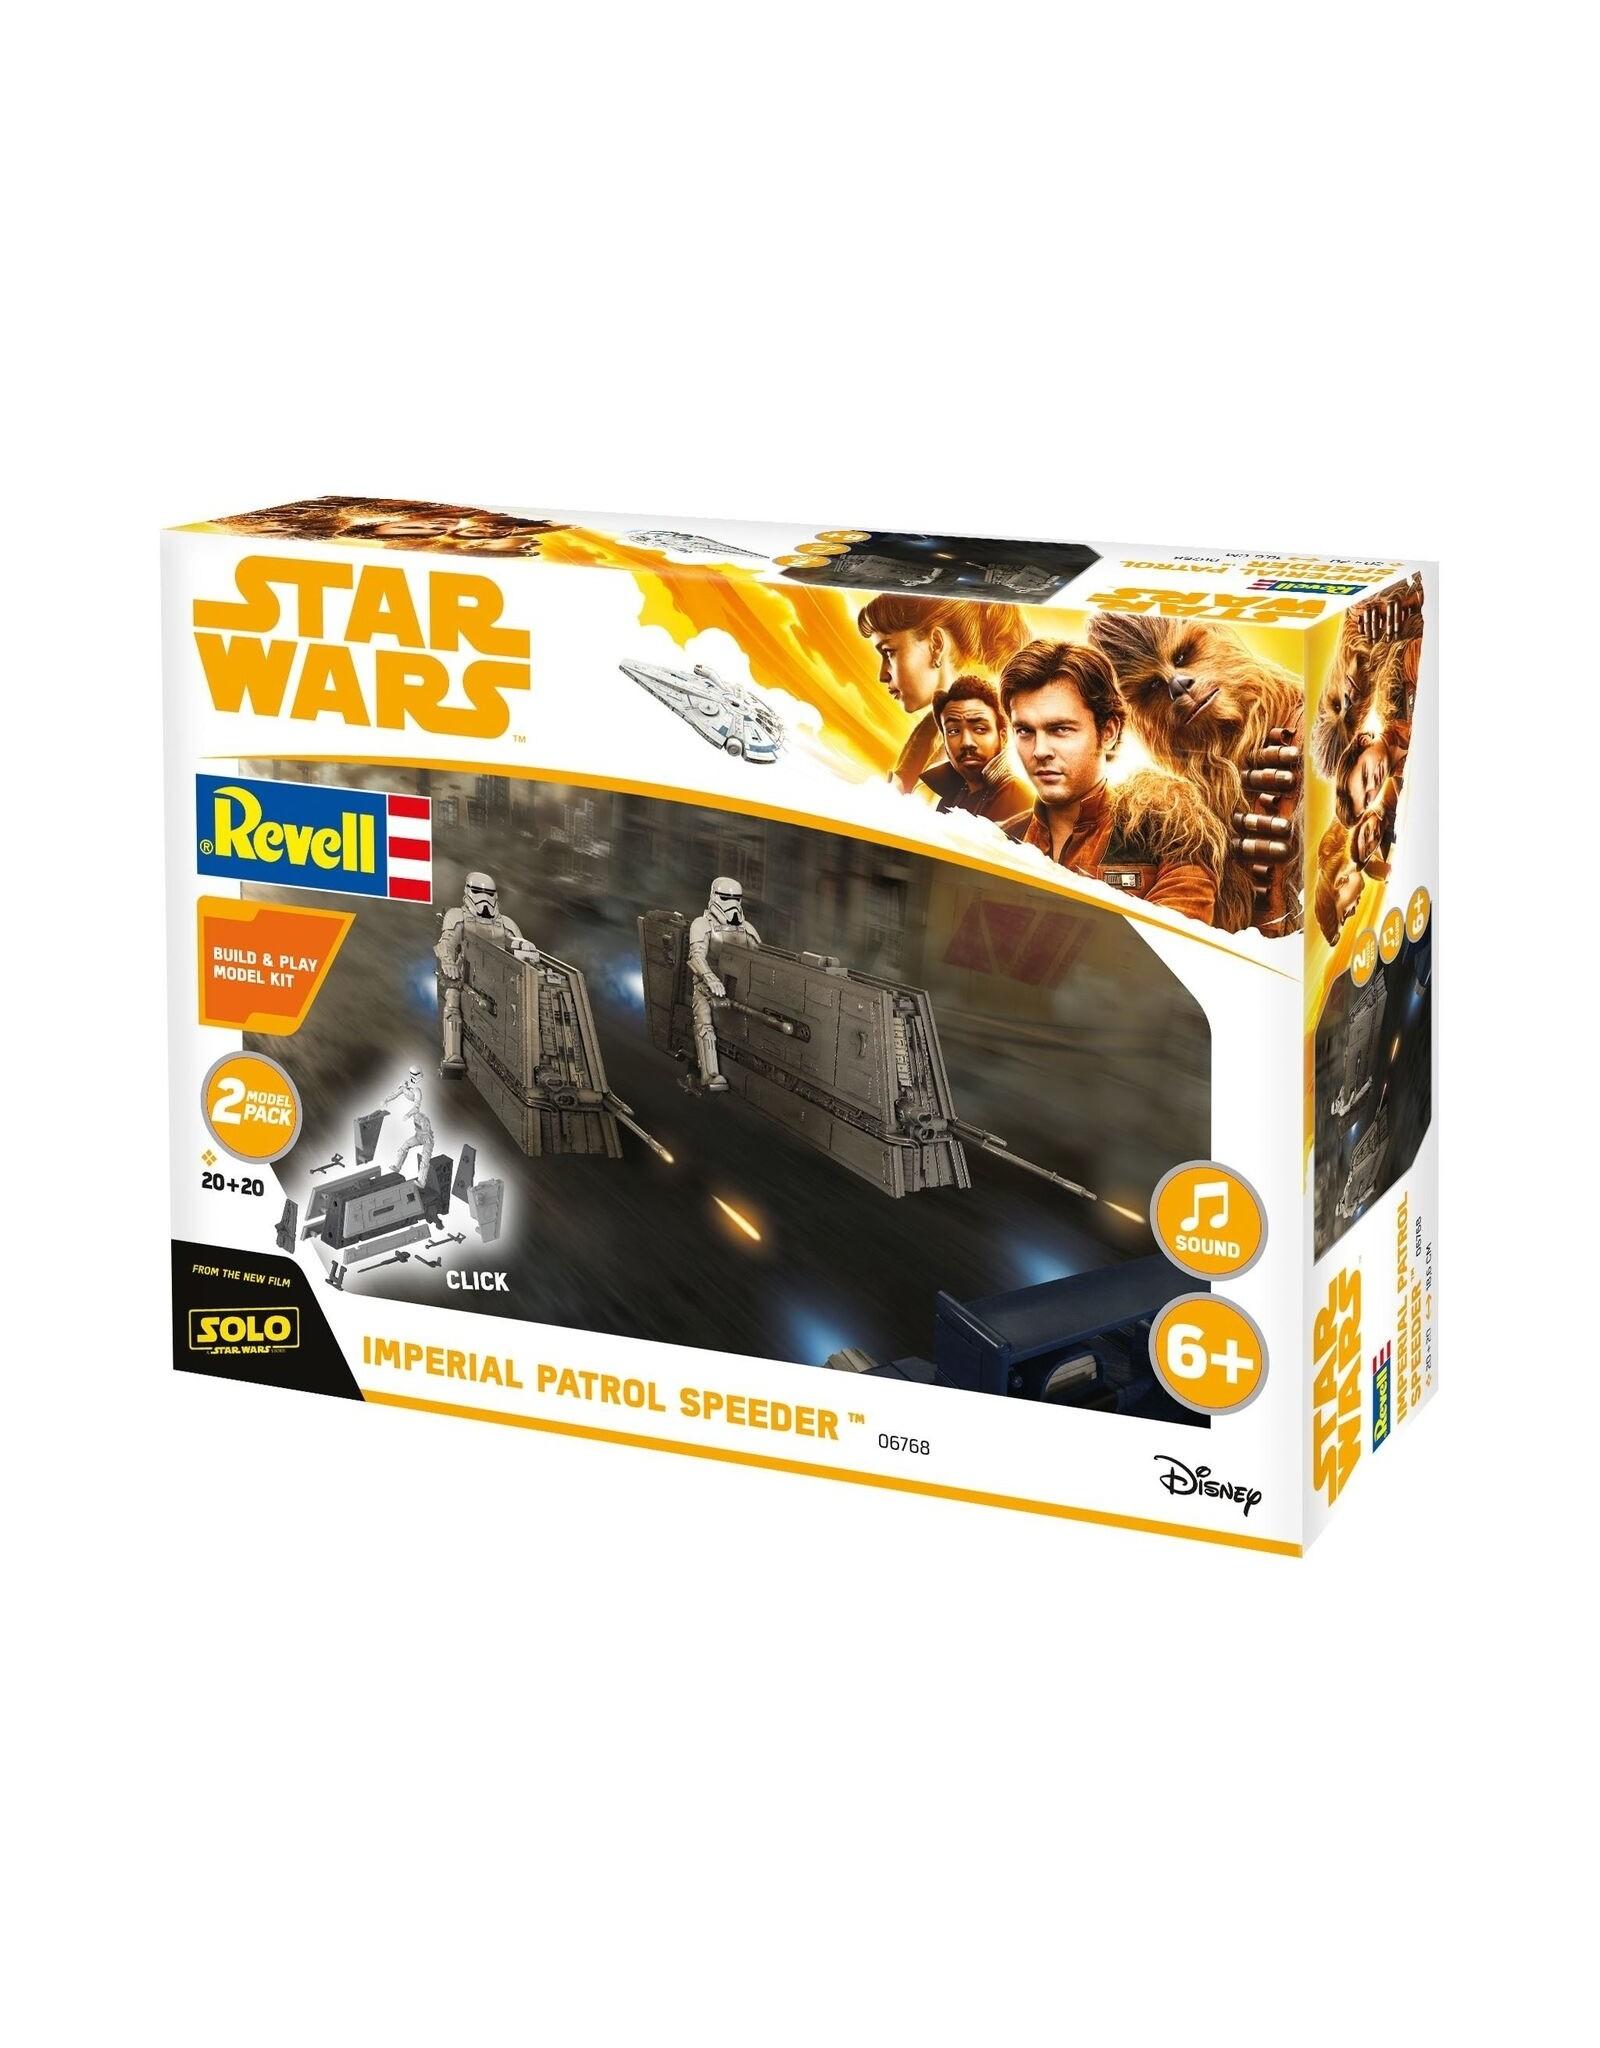 Star Wars Imperial Patrol Speeder - 1:28 - Revell